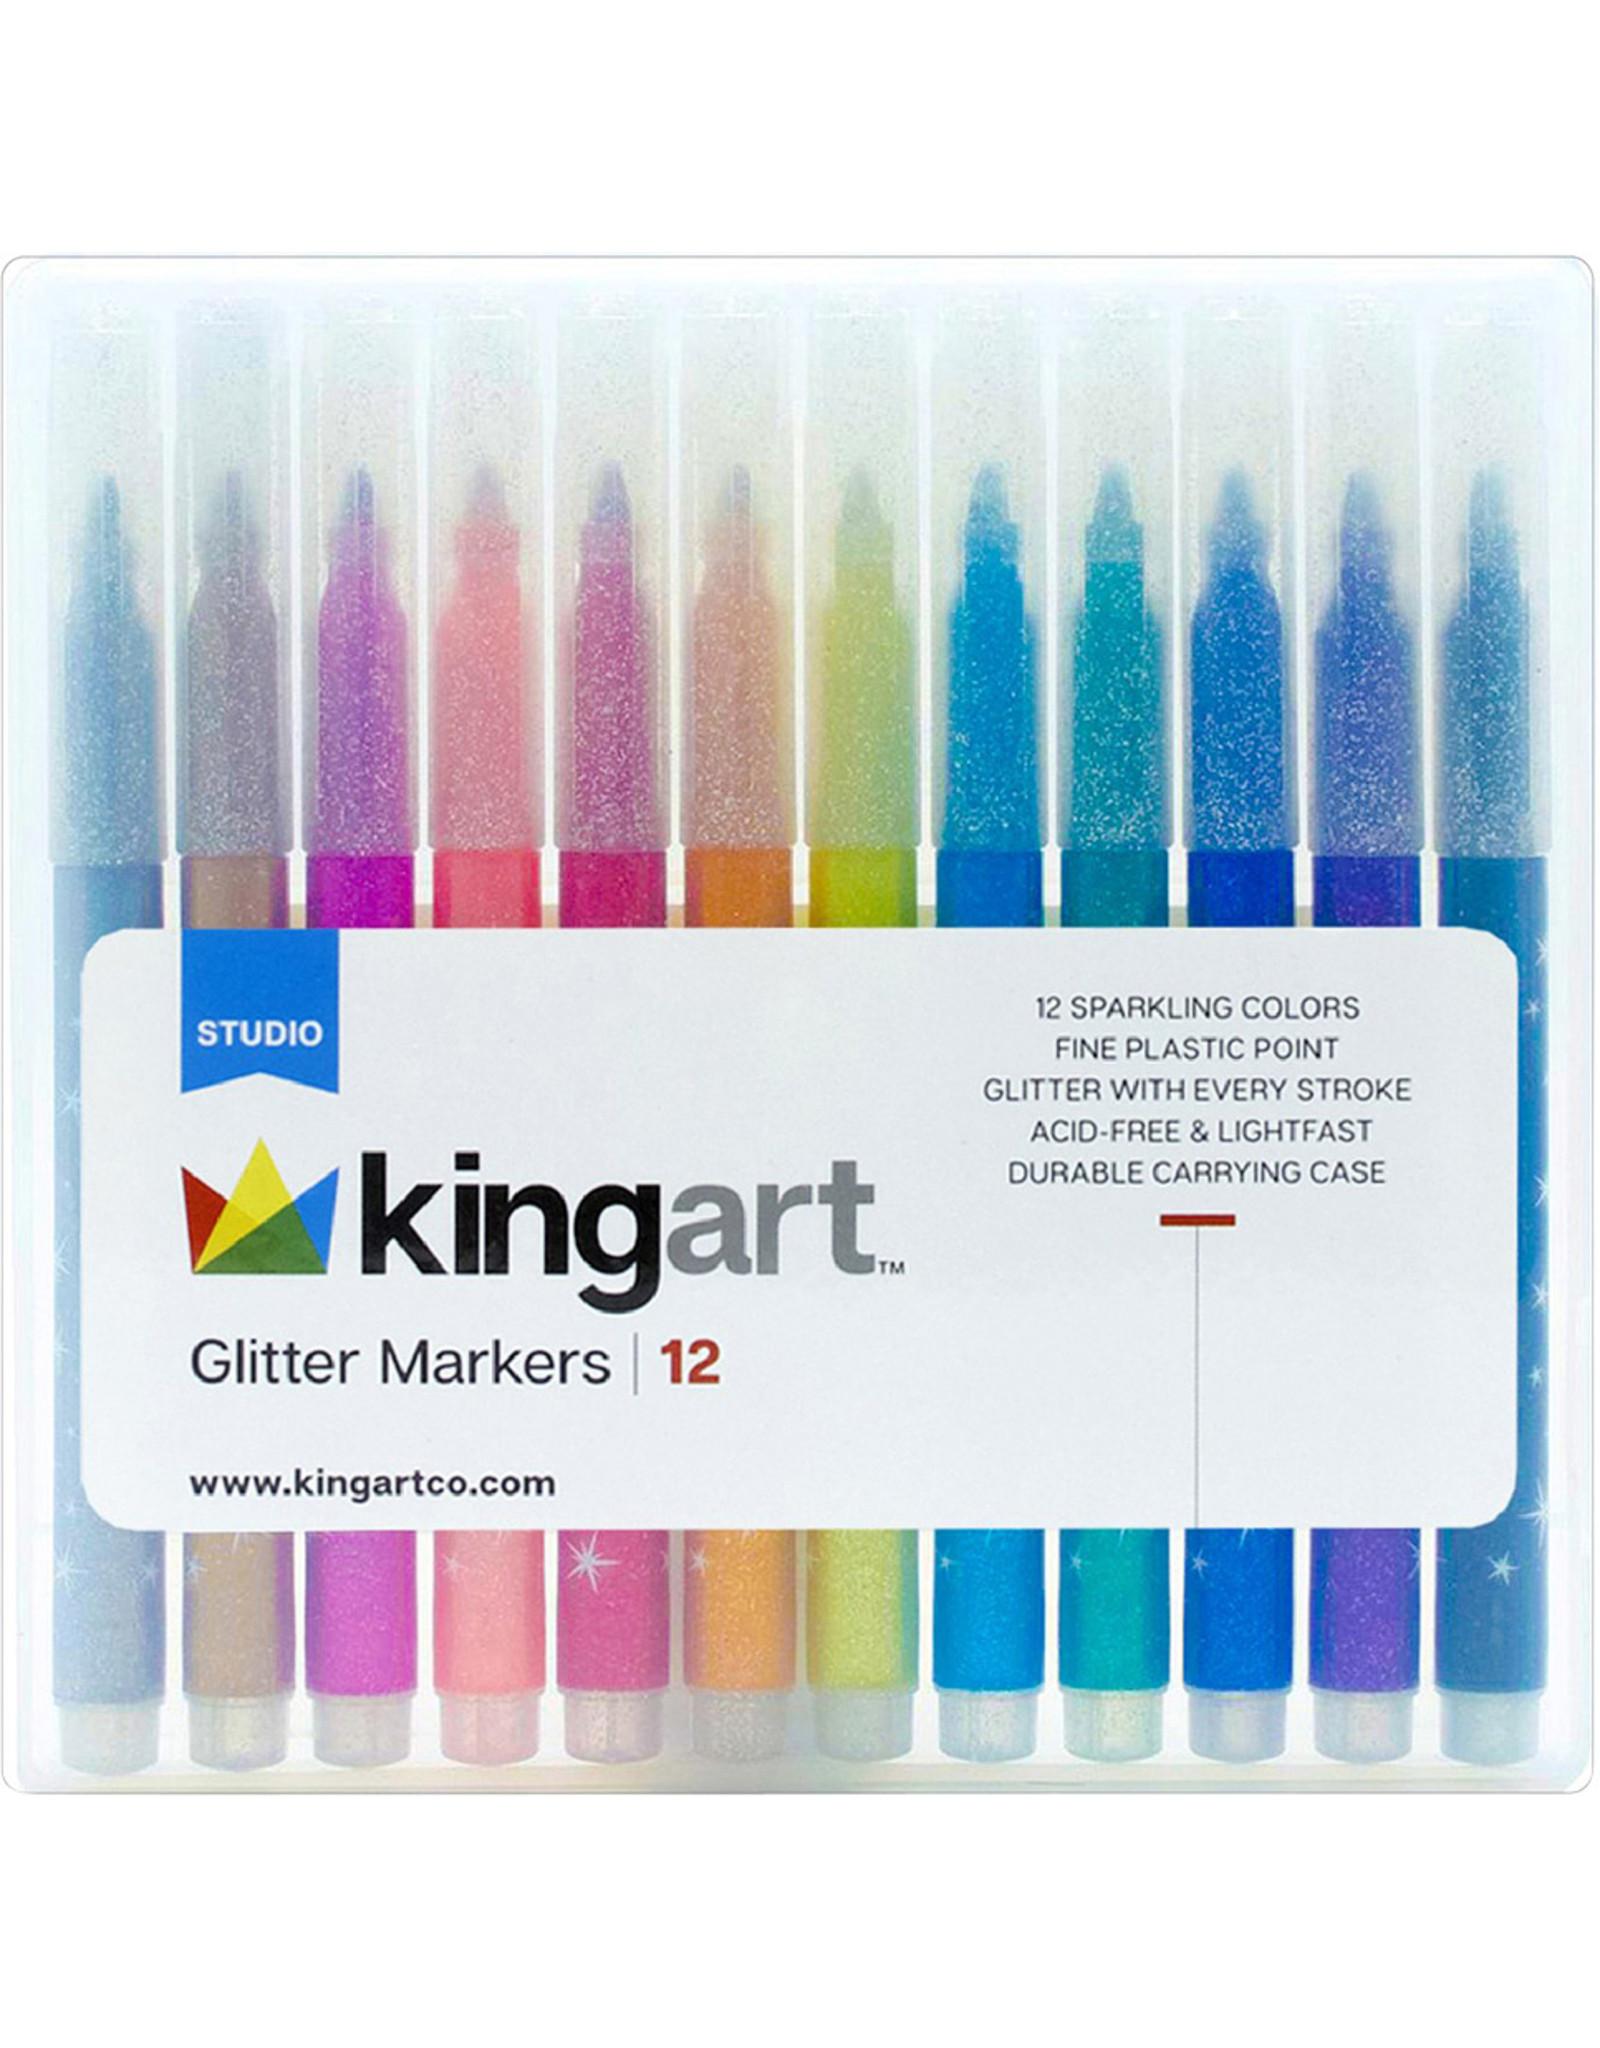 Kingart Glitter Markers - 12 Piece Set